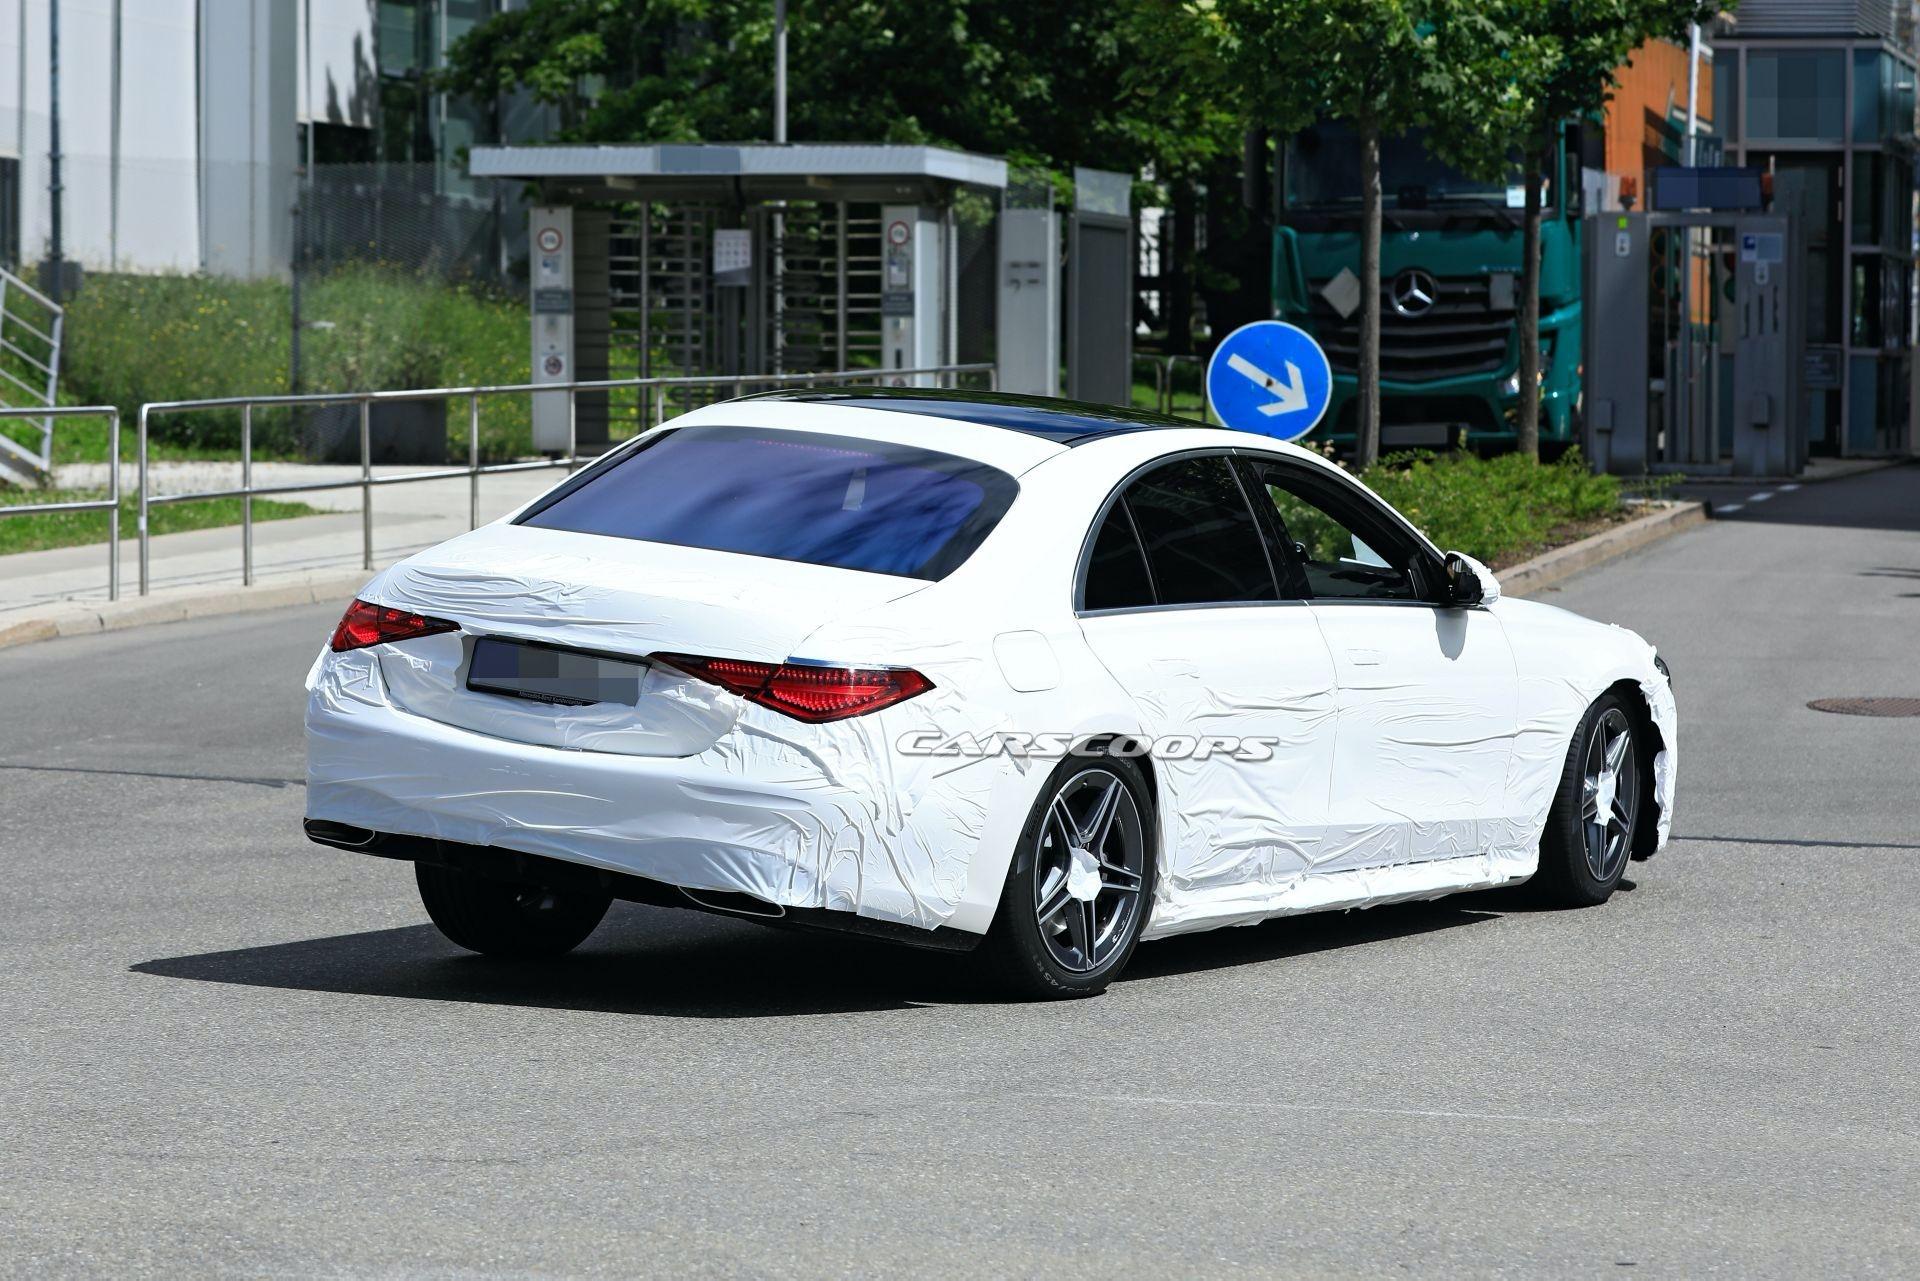 Mercedes Classe S 2021 cambia mimetismo